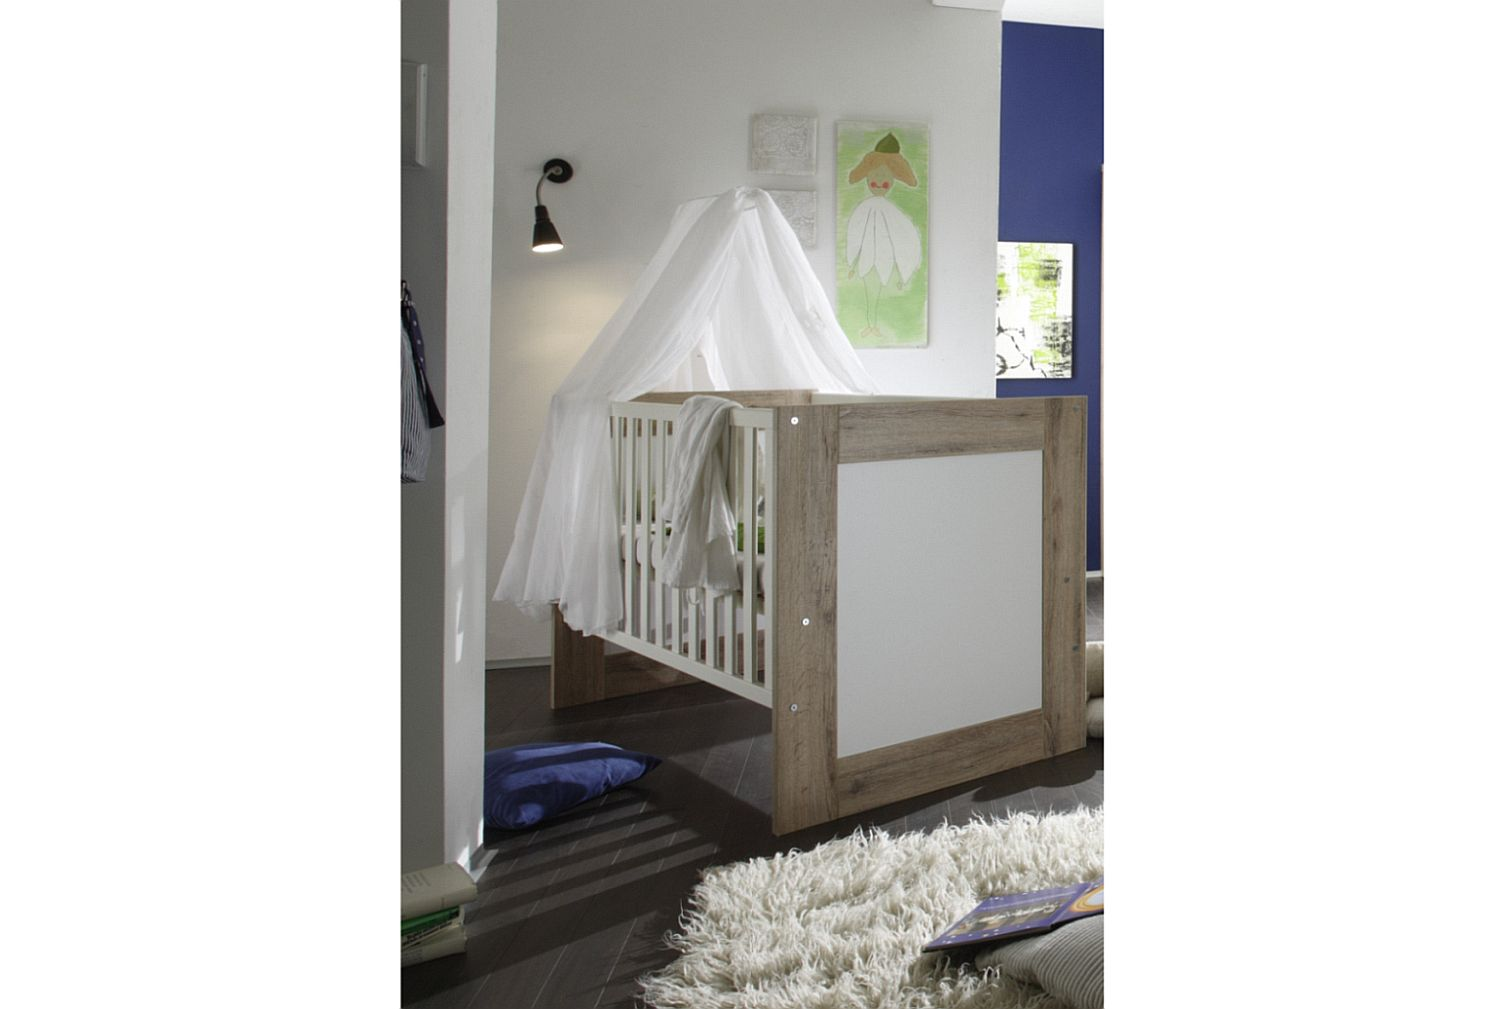 kinderbett bett babybett gitterbett umbaubar erweiterbar juniorbett neu baby ebay. Black Bedroom Furniture Sets. Home Design Ideas